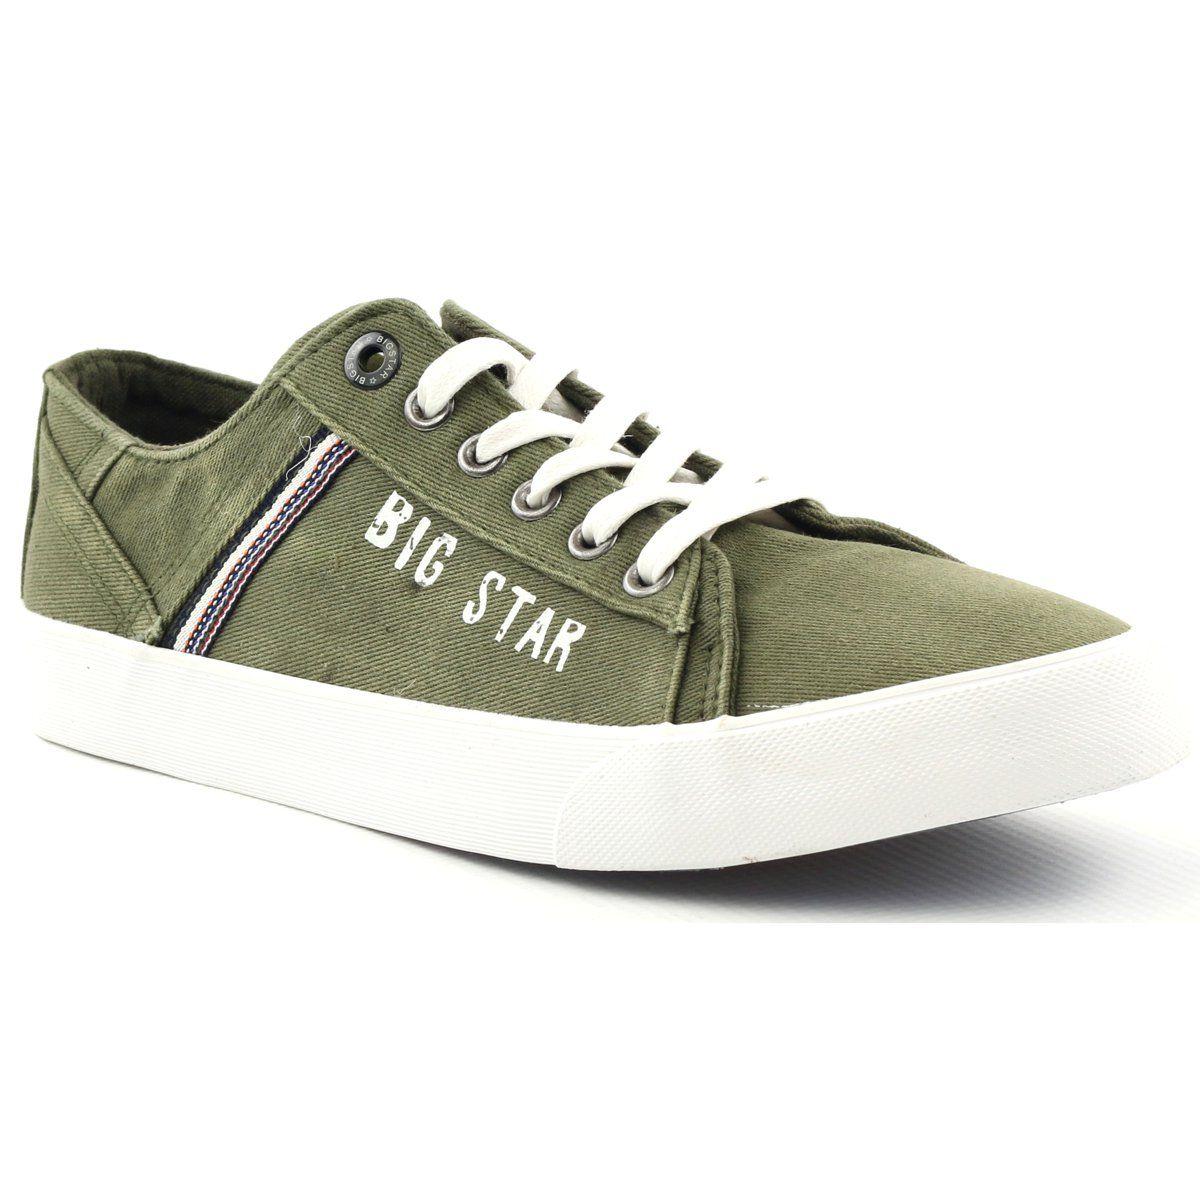 Trampki Tenisowki Big Star 174315 Jeans Khaki Zielone Sneakers Sneakers Men Star Shoes